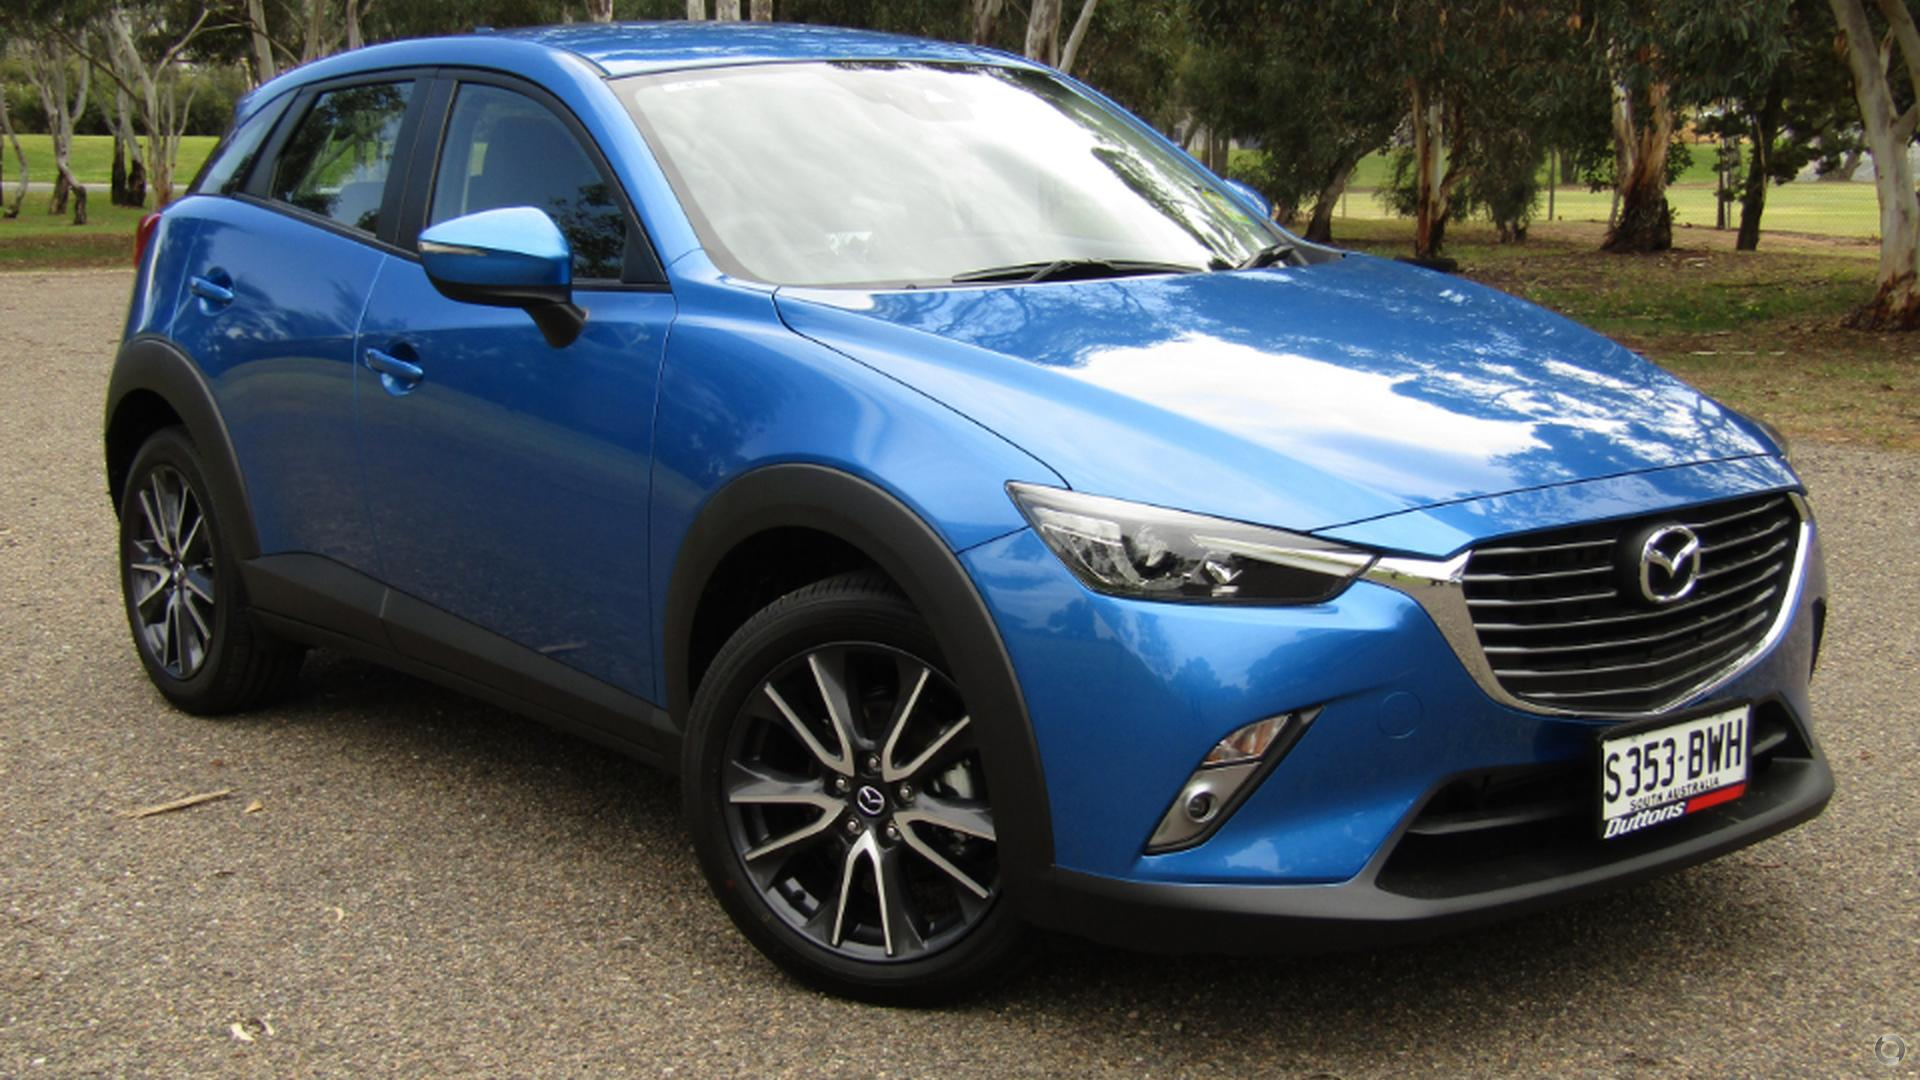 2018 Mazda Cx-3 Stouring